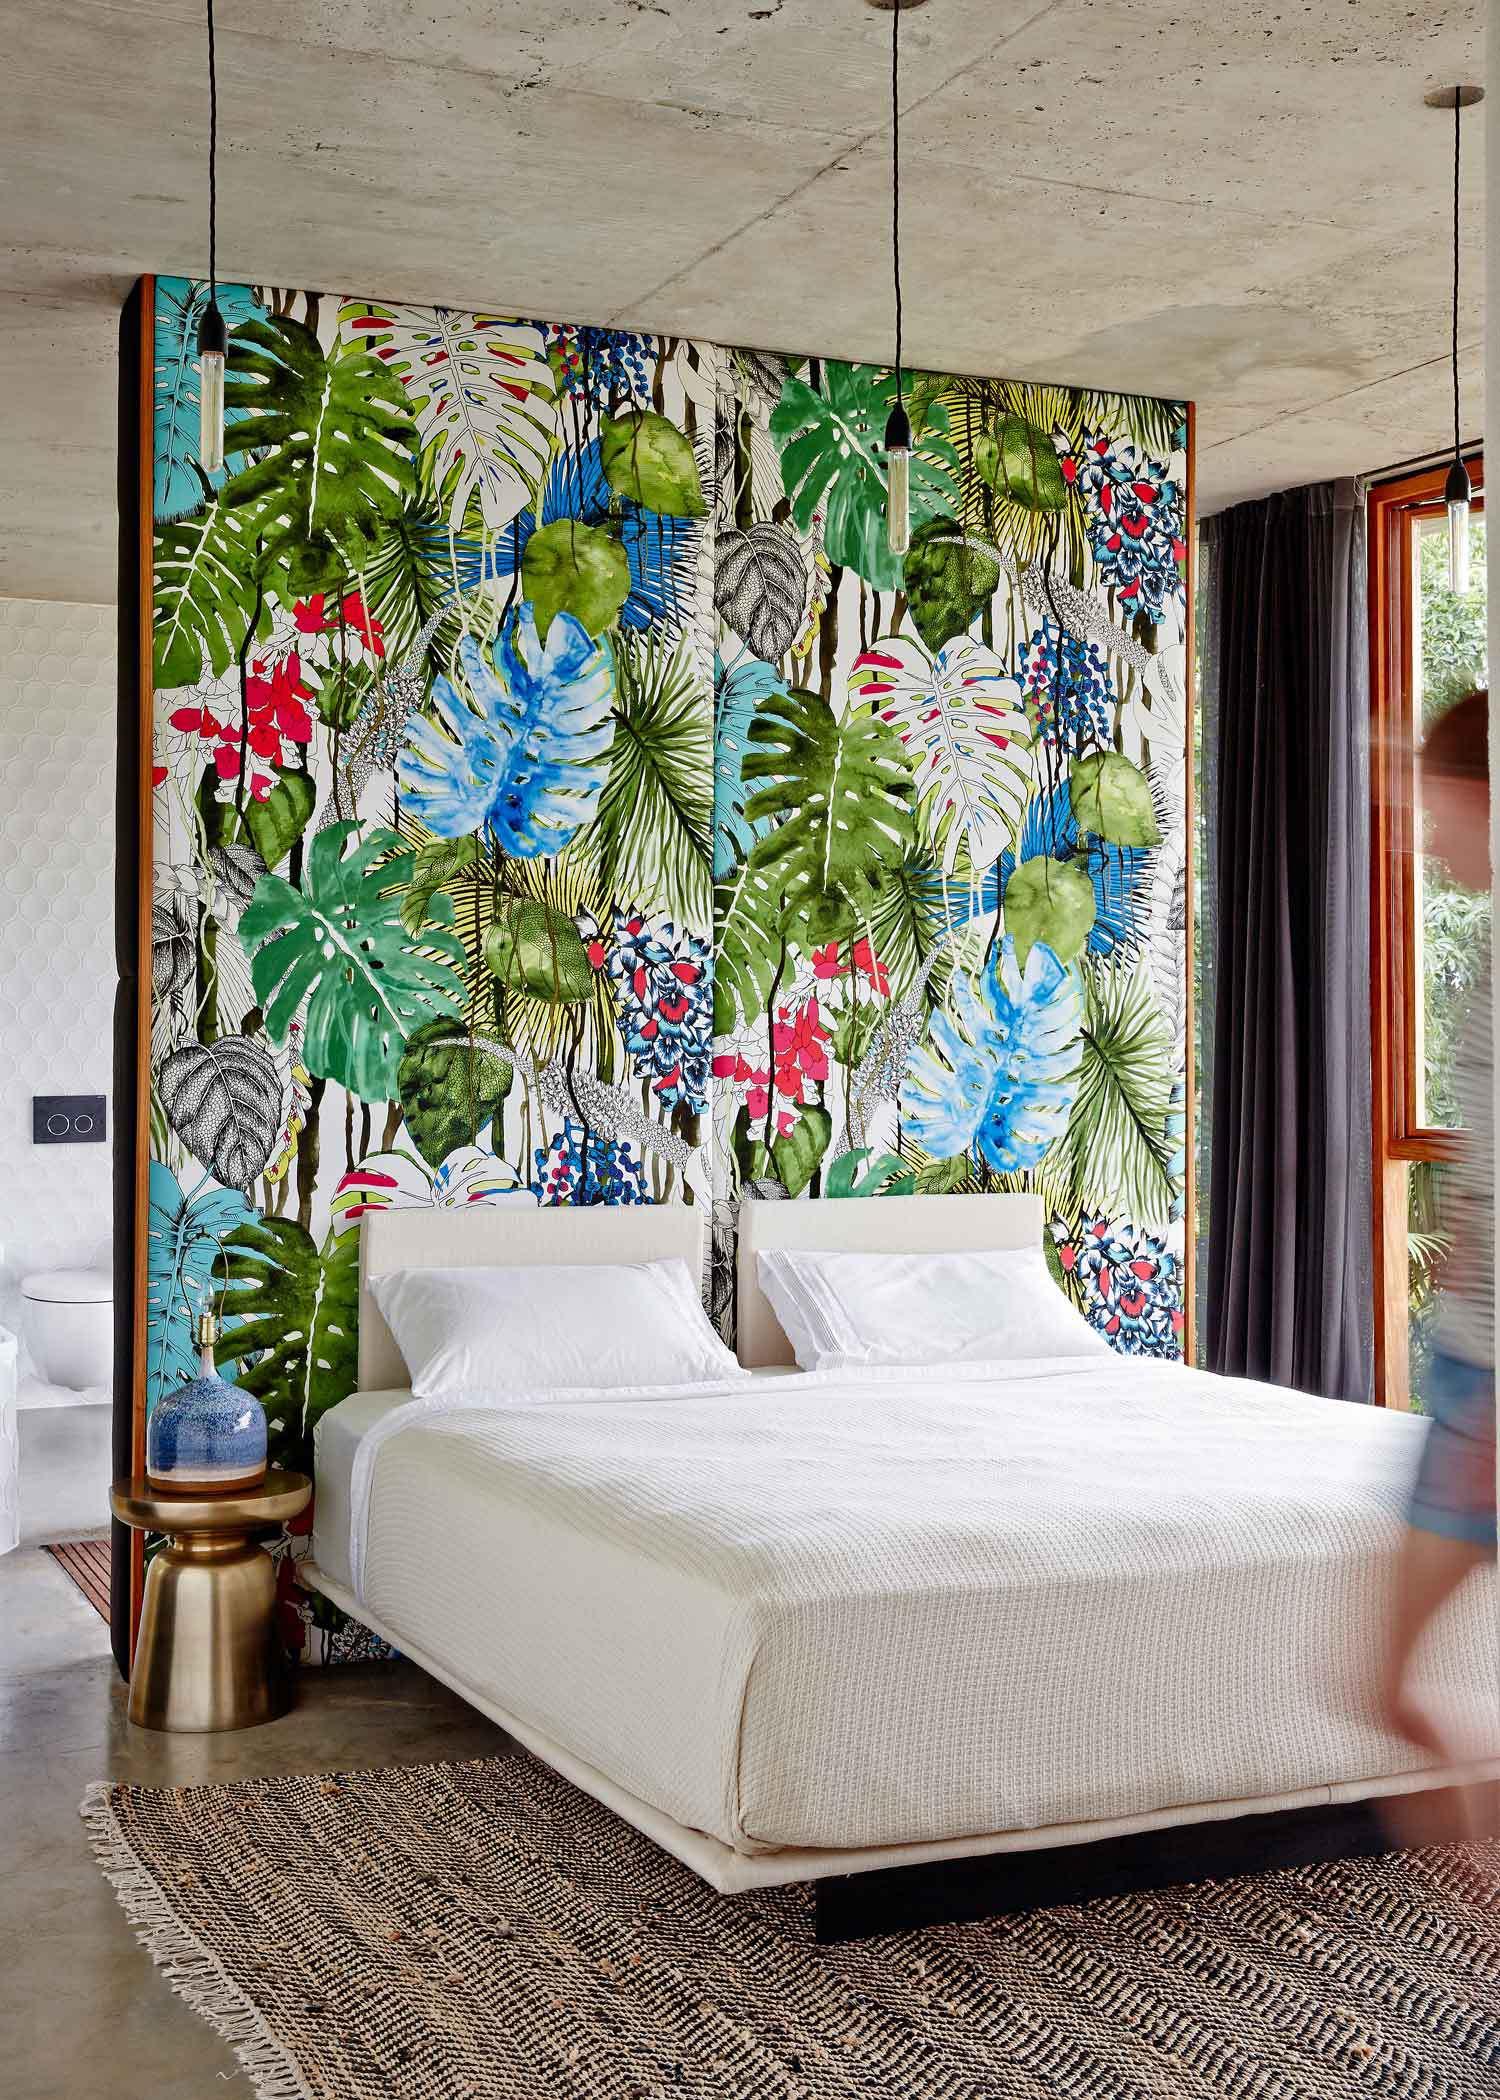 57 - bedhead - Planchonella-House-Jesse-Bennett-Architect-Yellowtrace-13.jpg